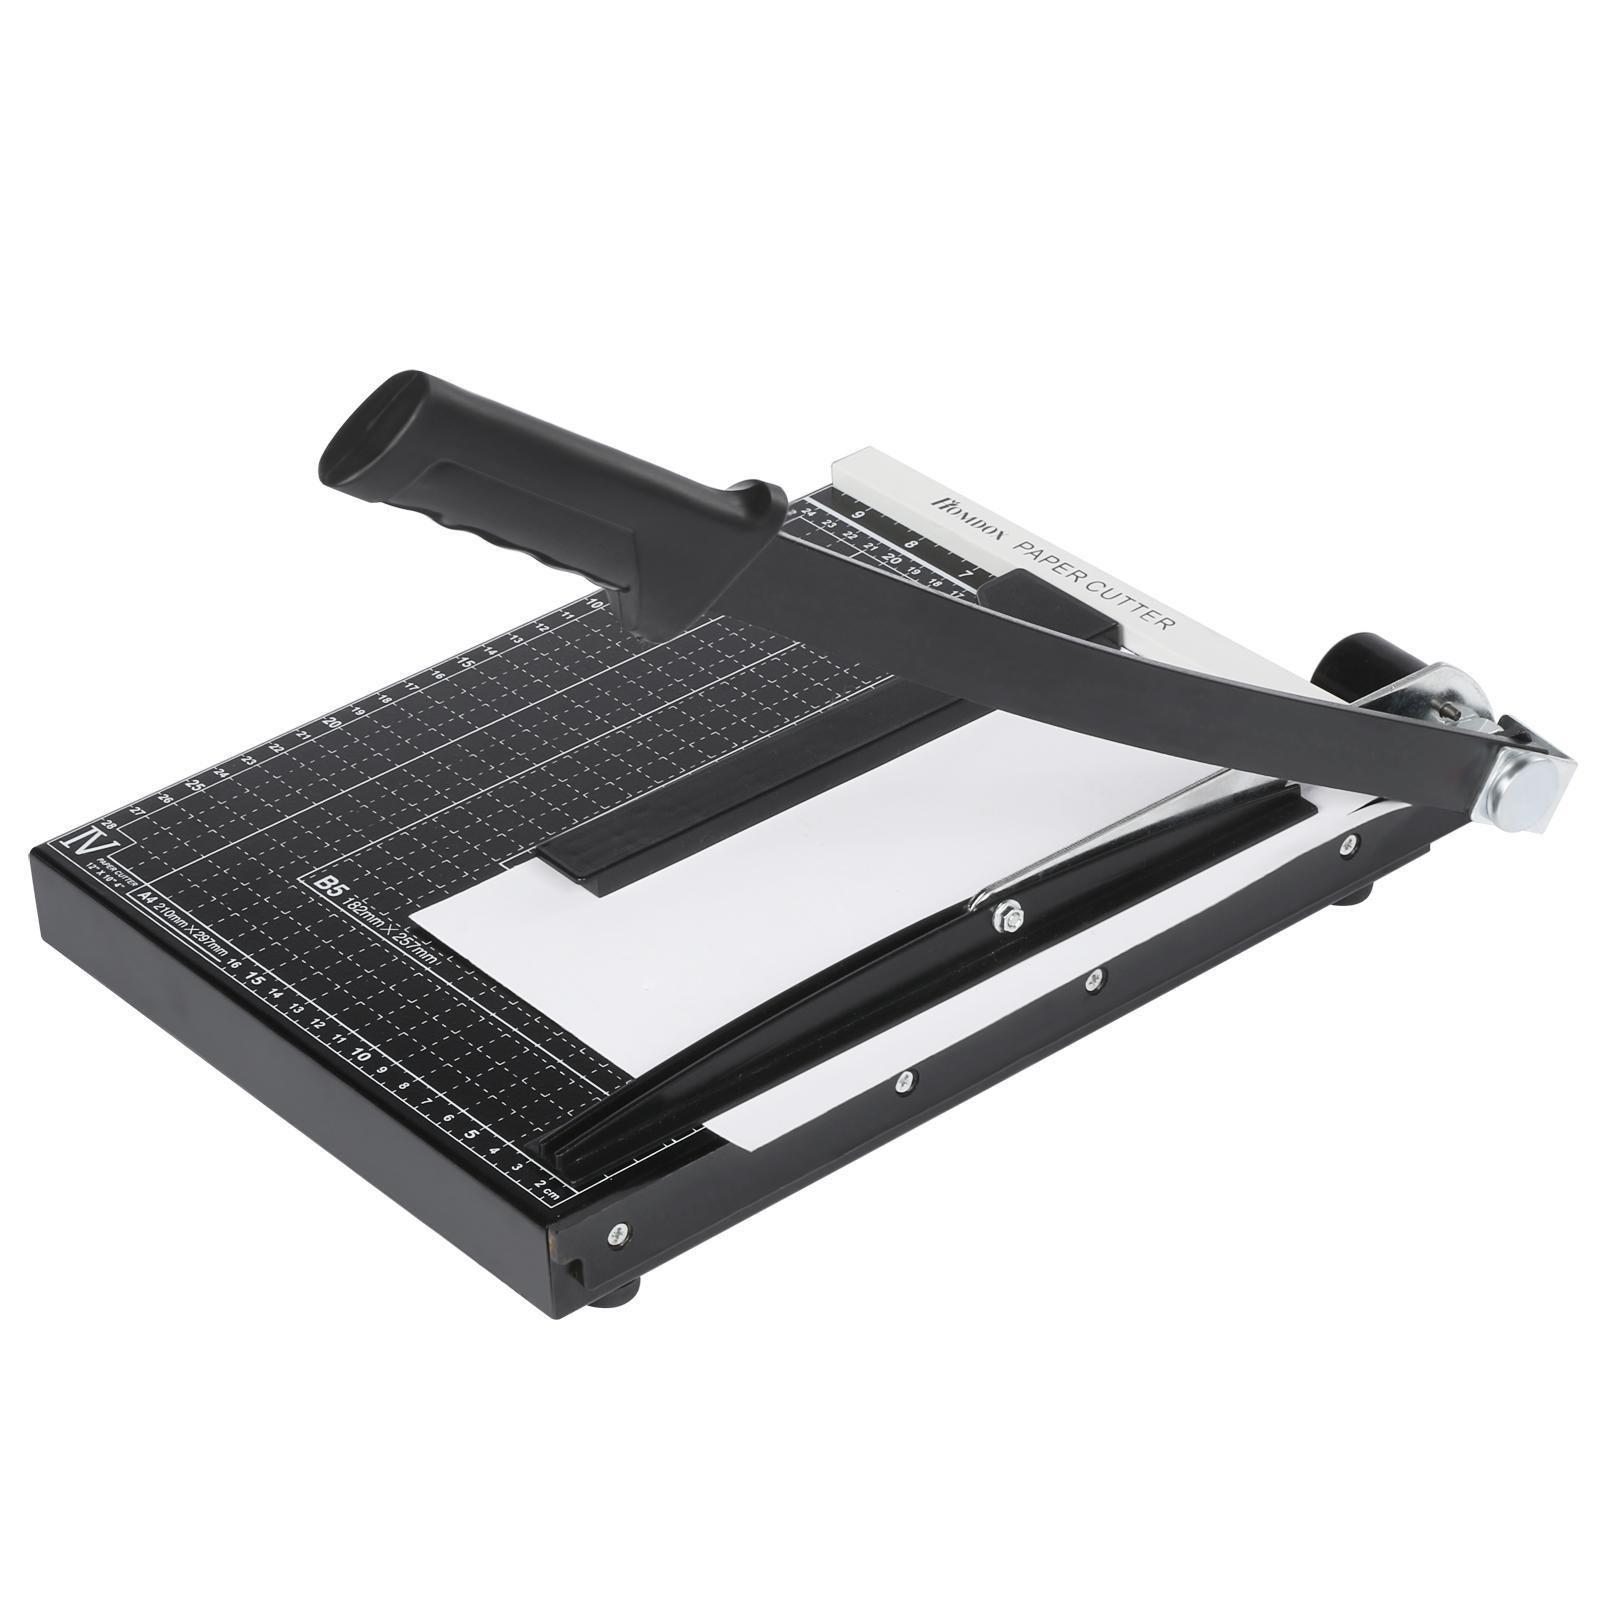 Corgy Heavy Duty Professional Office Home A4 Paper Desk Tops Paper Cutter Trimmer Scrap Machine(US STOCK)